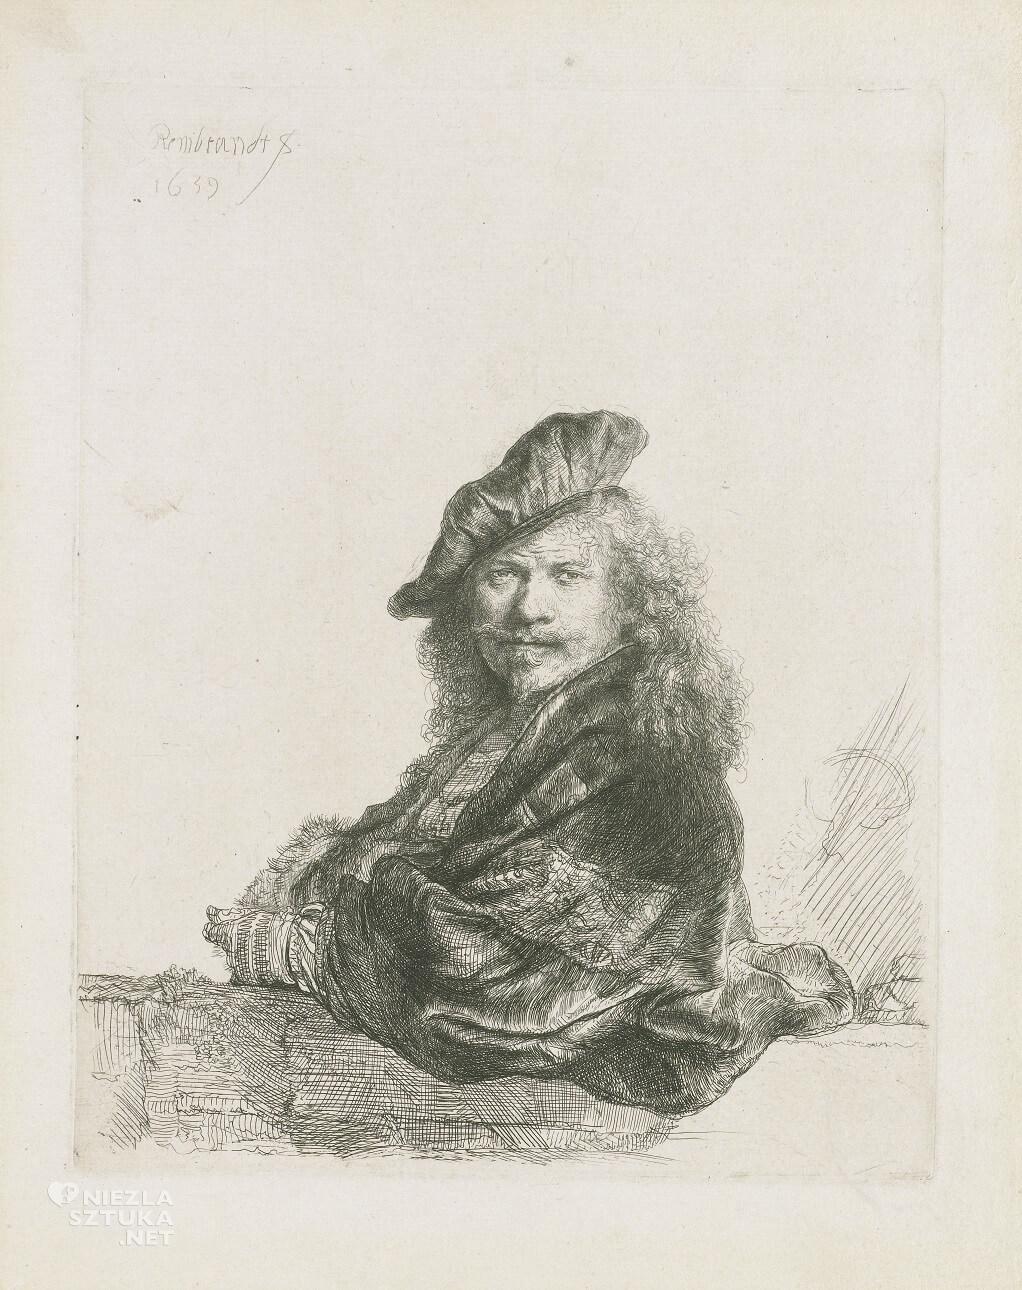 Rembrandt <em>Autoportret</em> | 1639, akwaforta, Rijksmuseum, Amsterdam